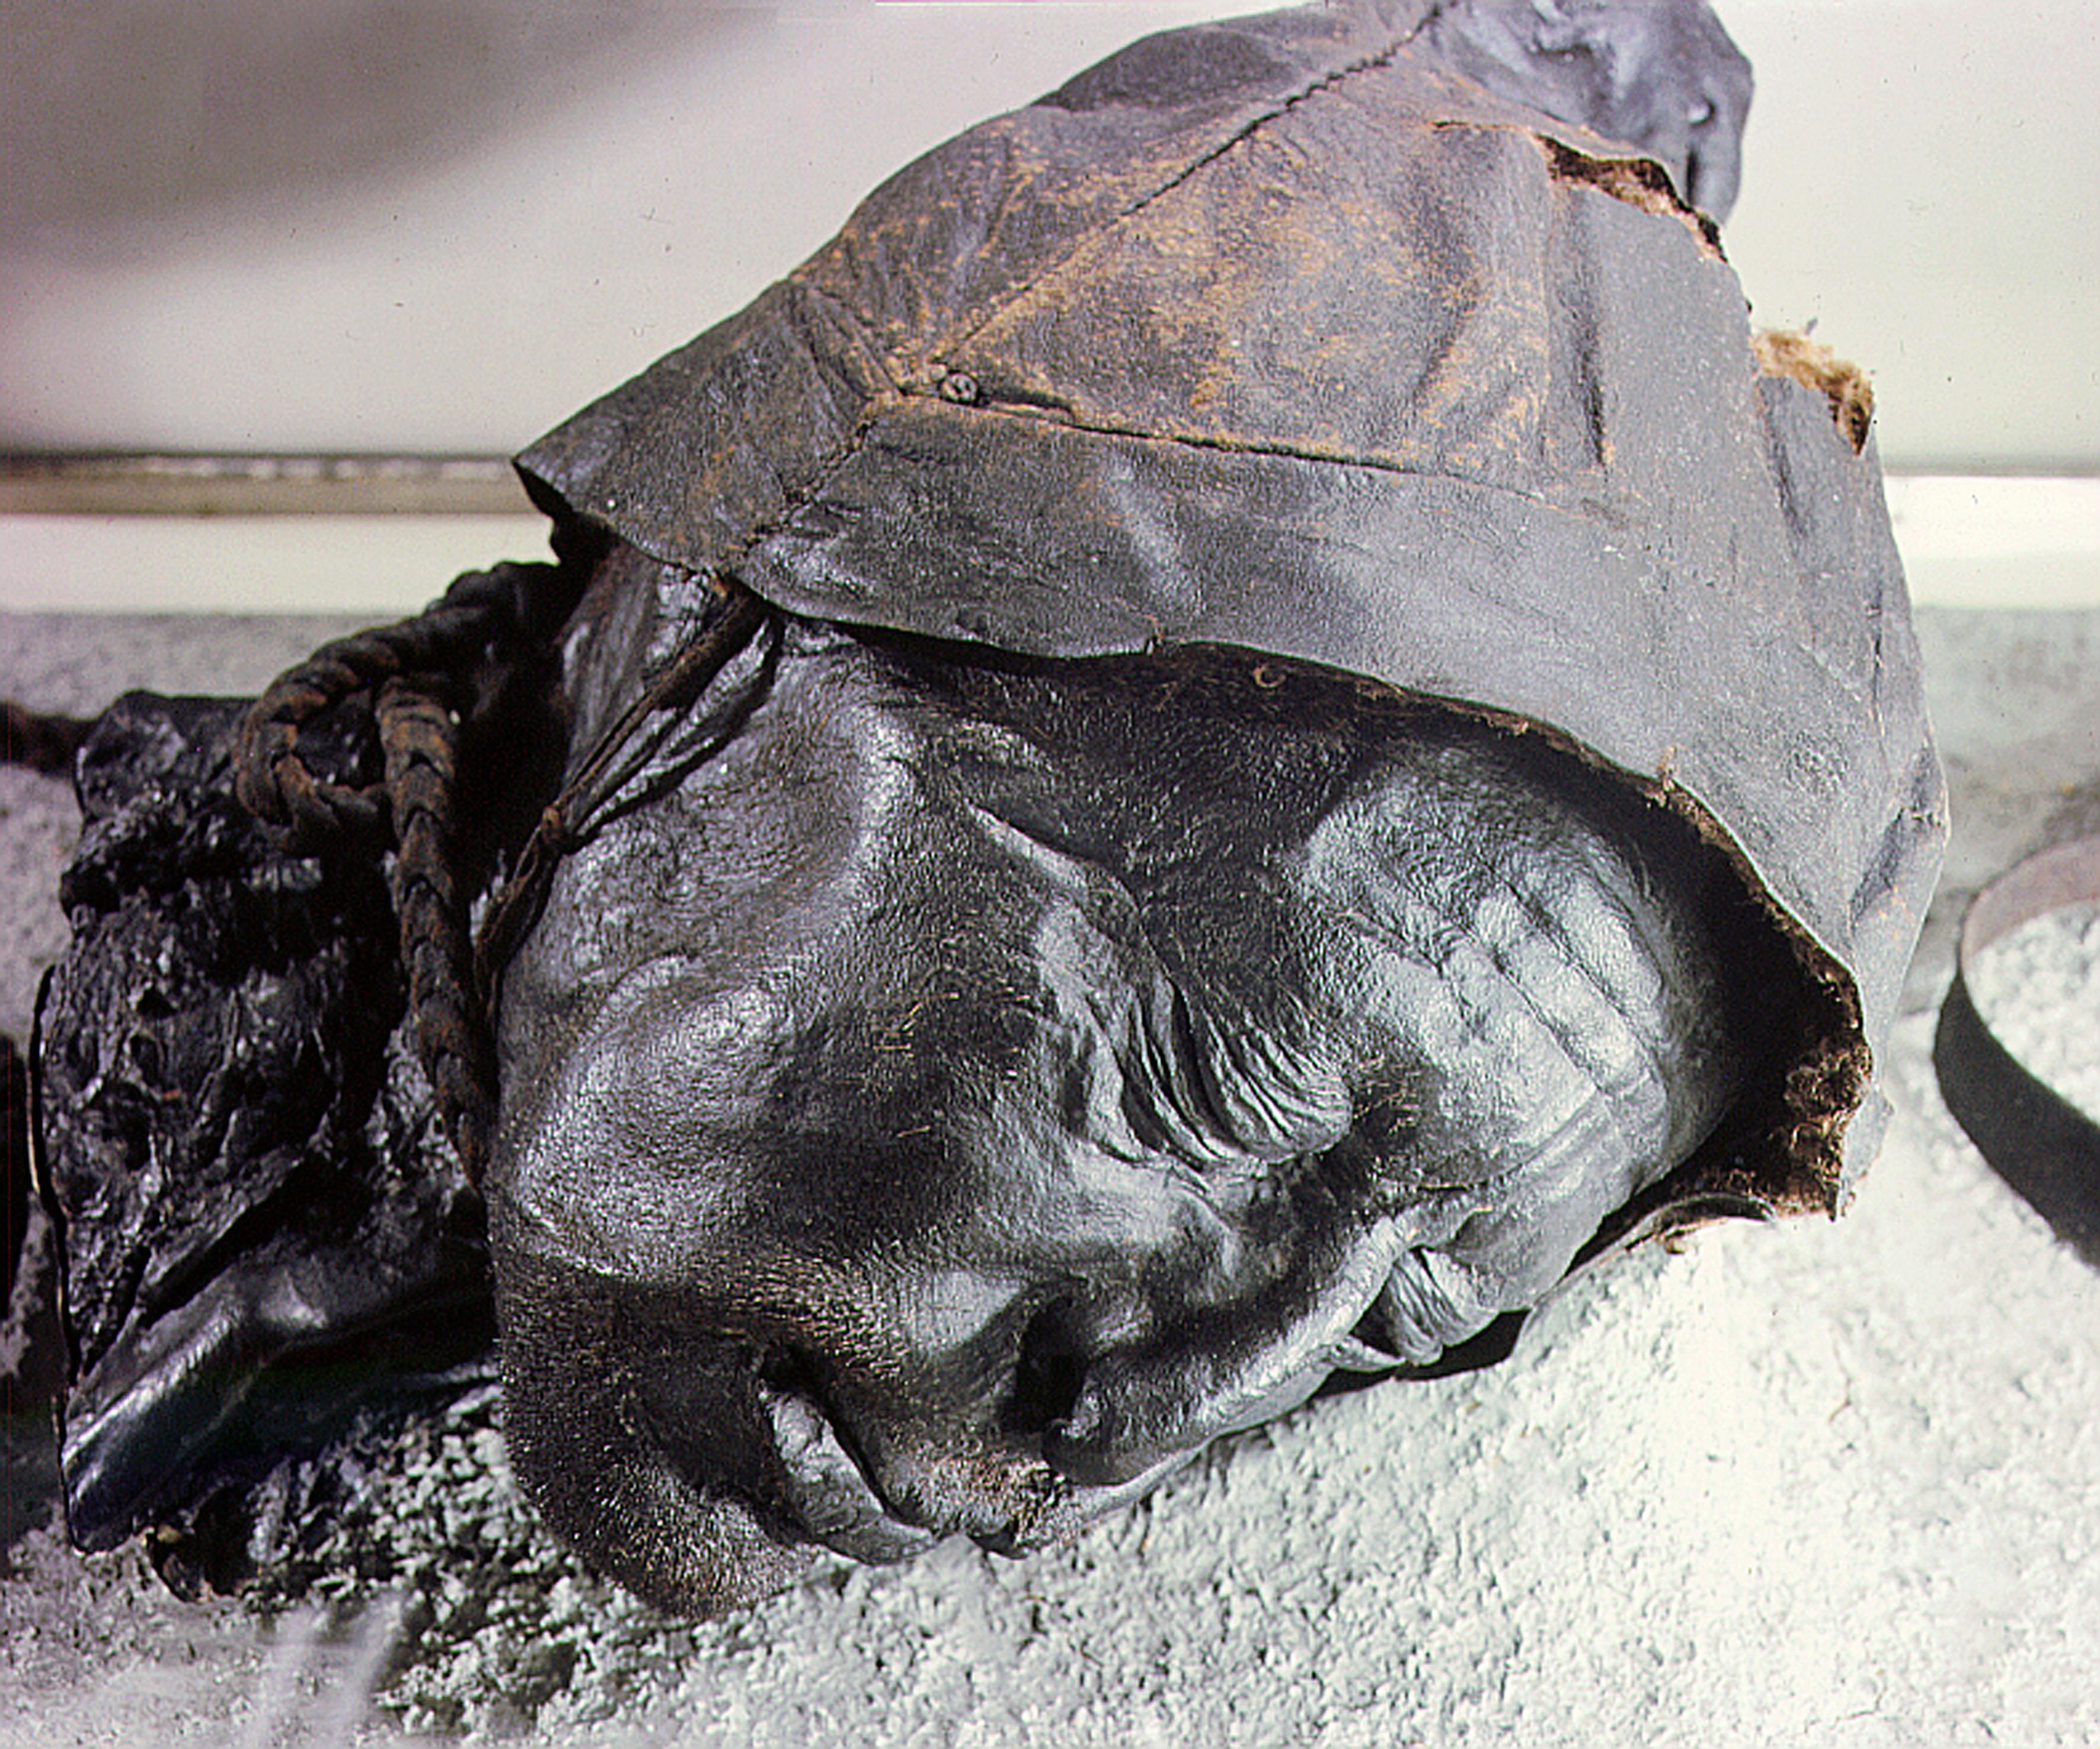 Tollund man, victim of human sacrifice by ritual strangulation in Denmark.